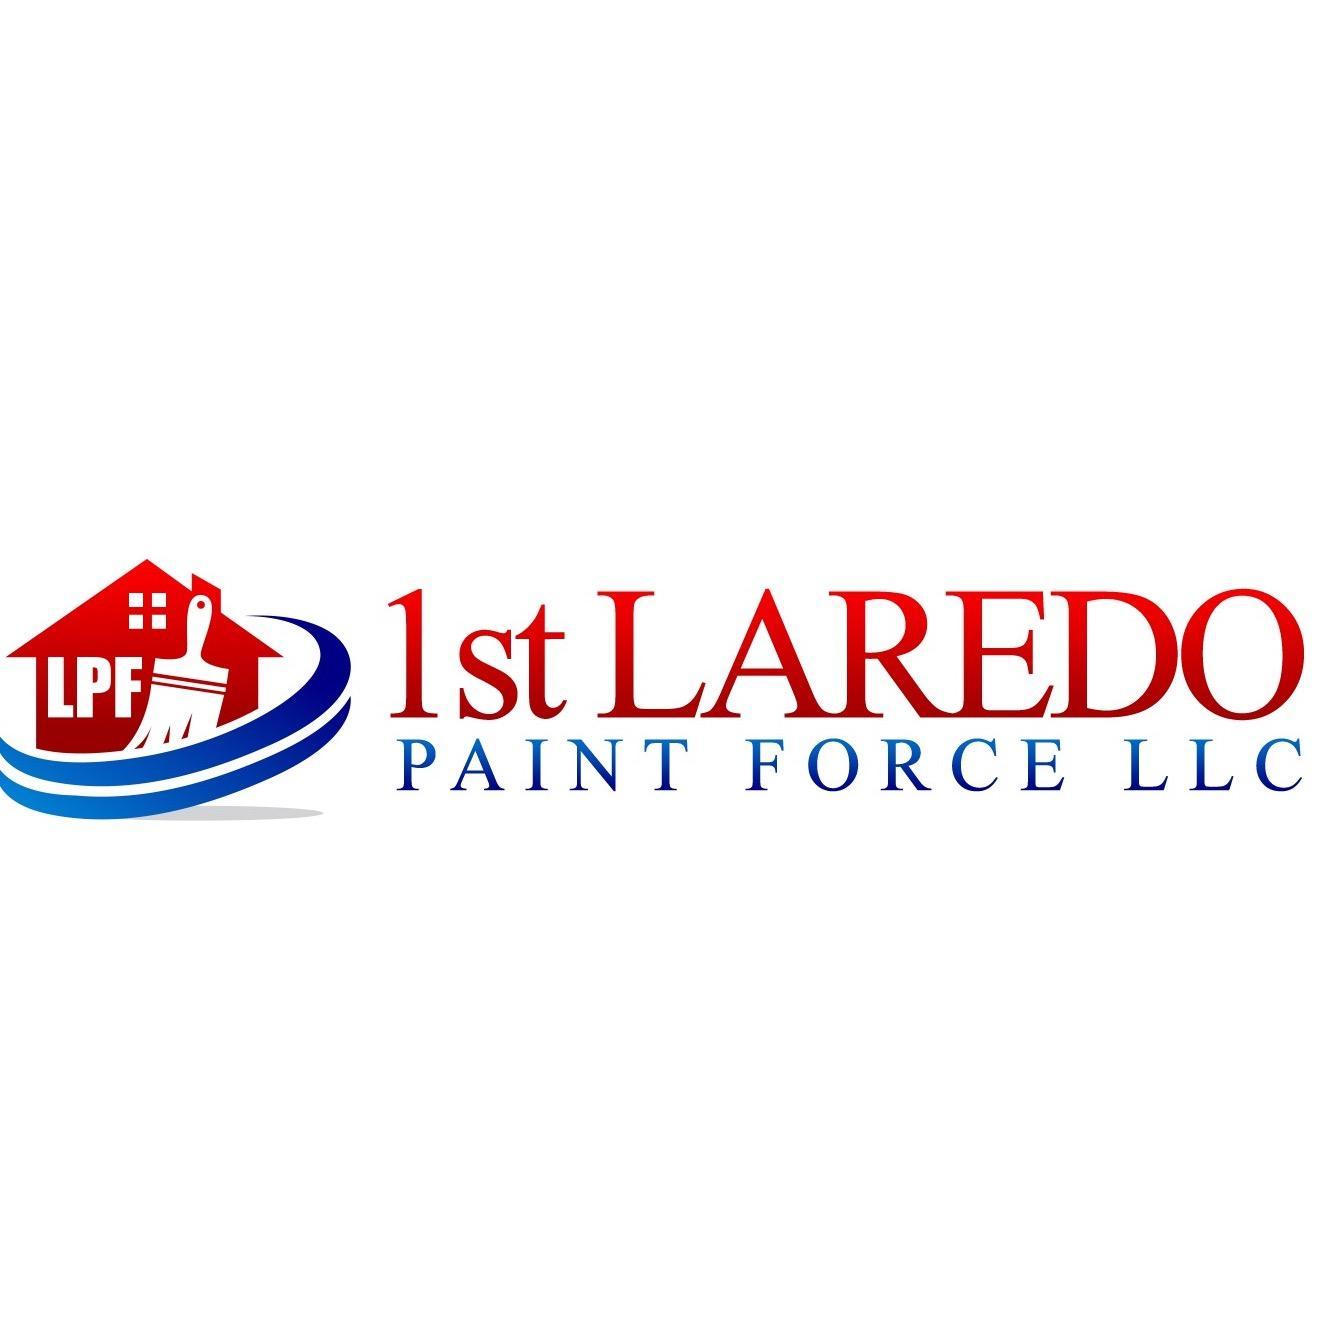 1st Laredo Paint Force, LLC Logo